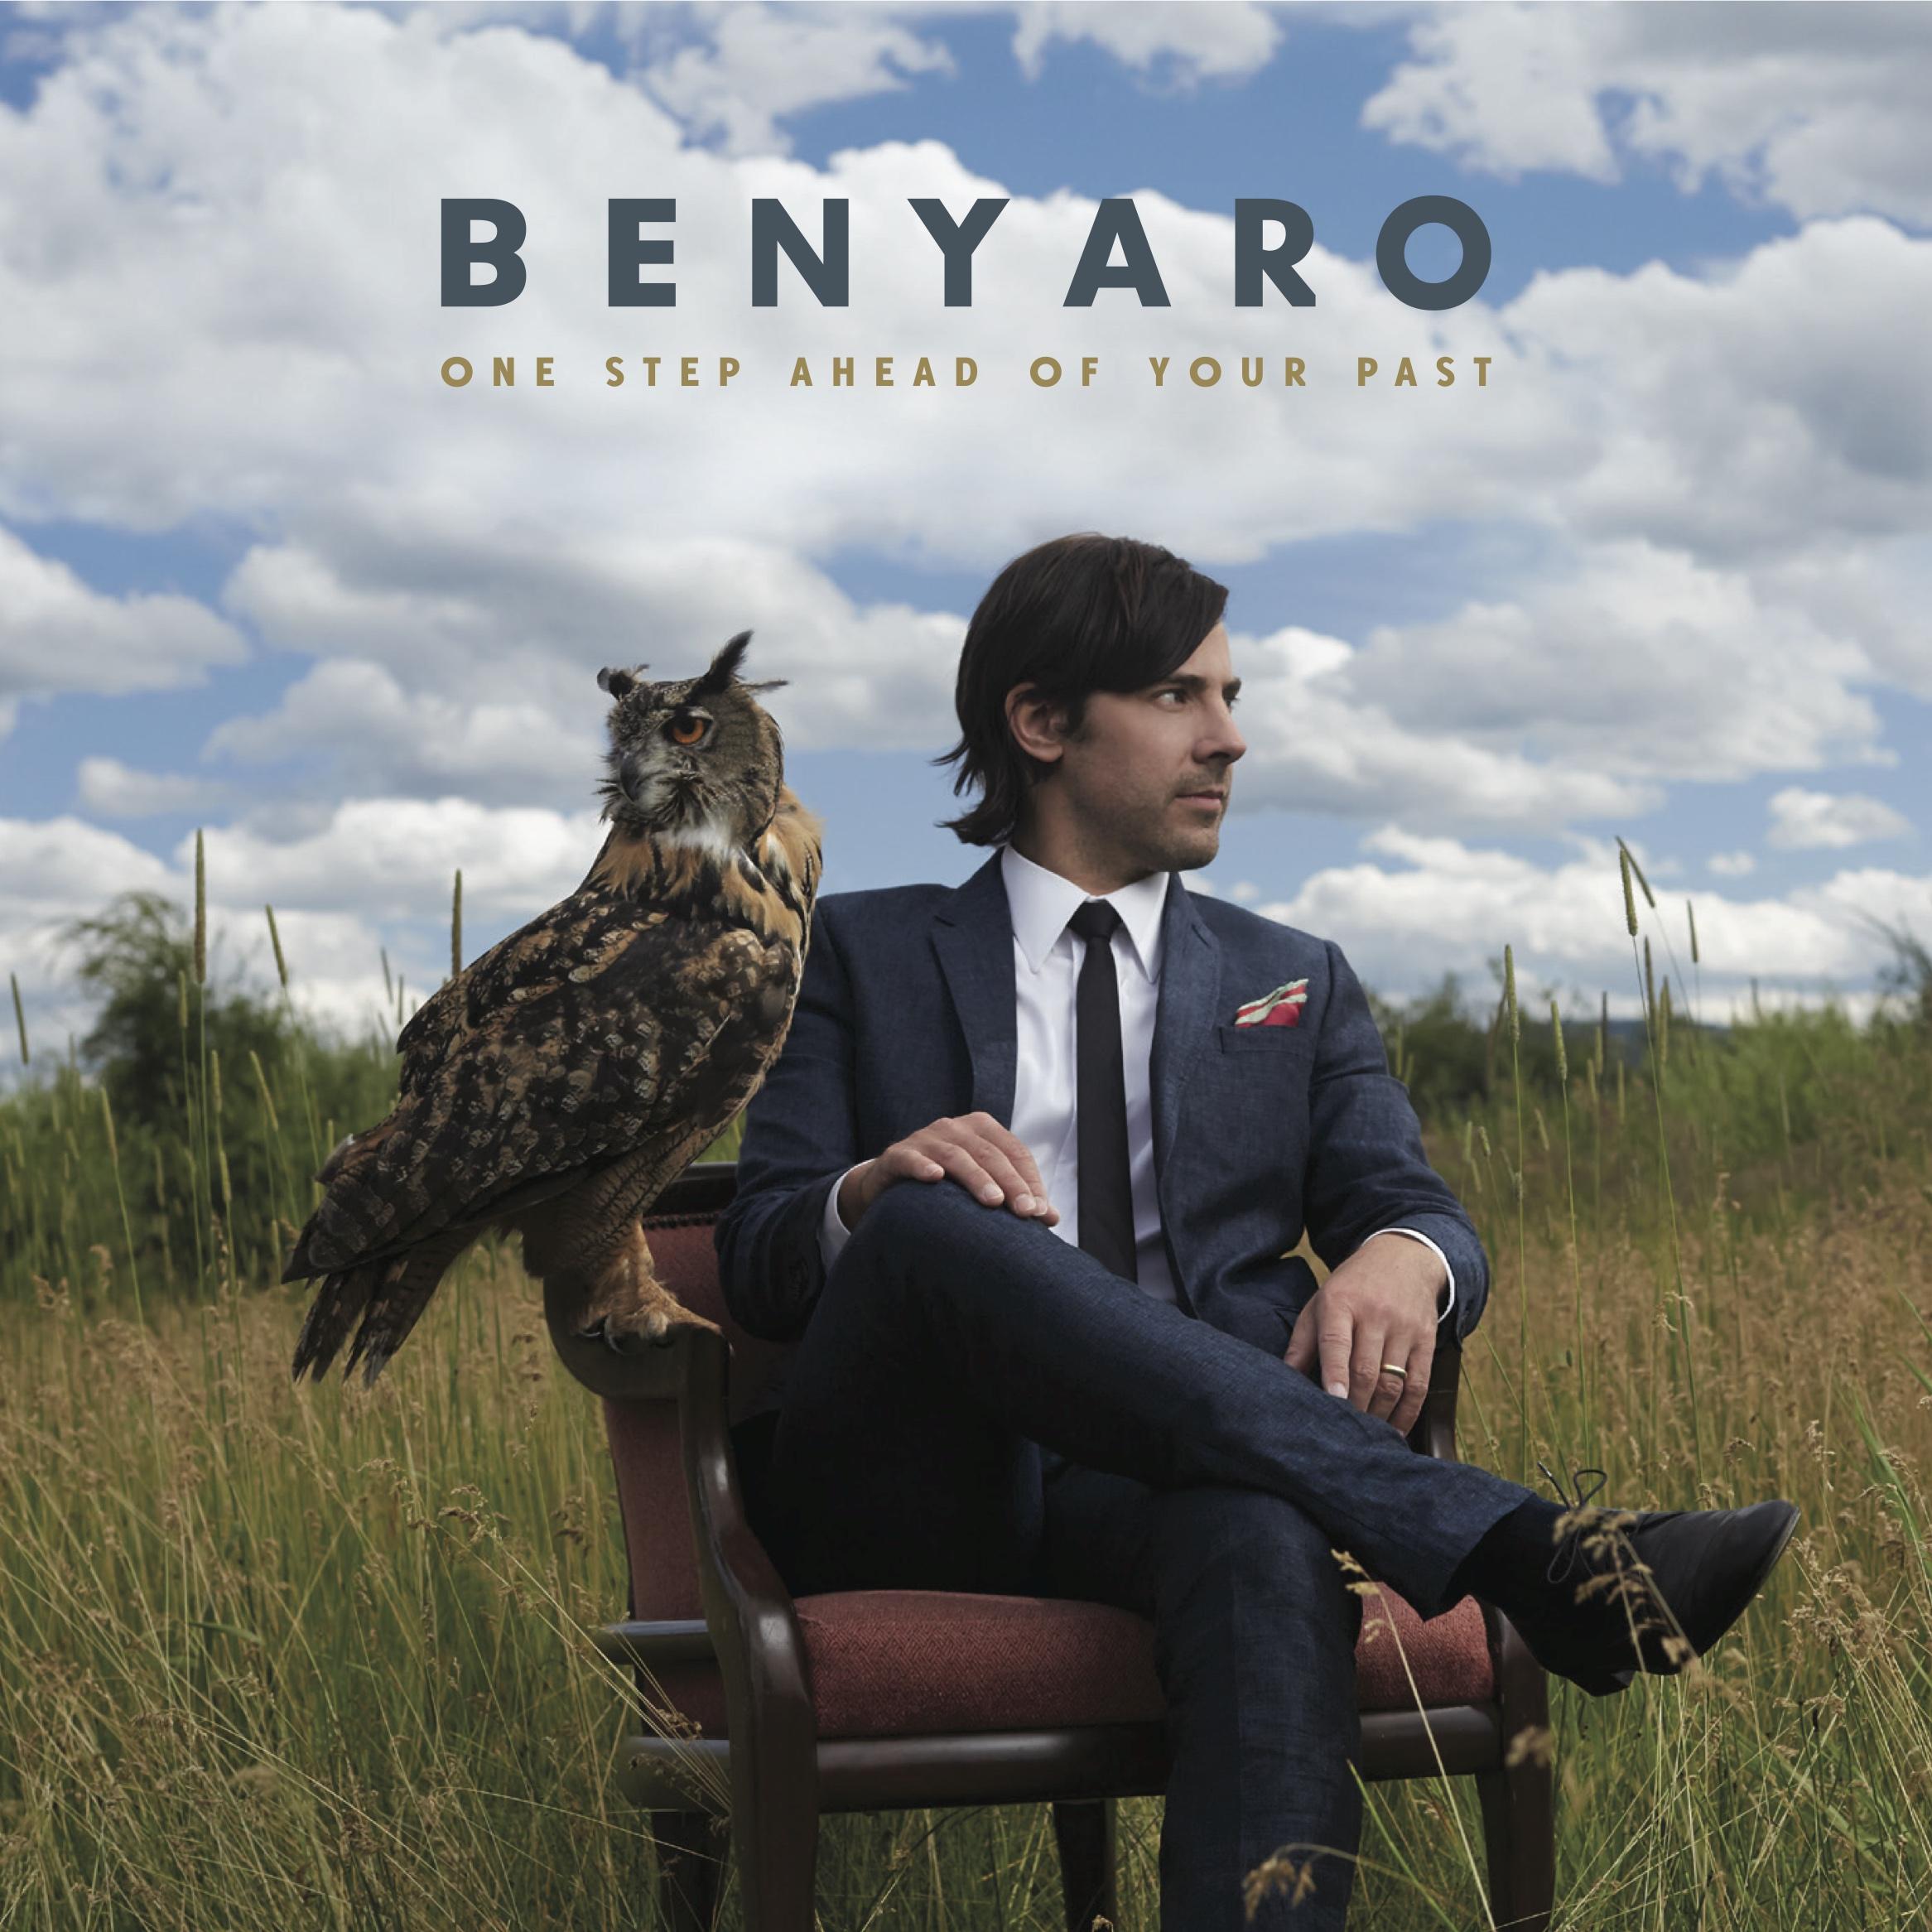 courtesy of Benyaro - Album Cover